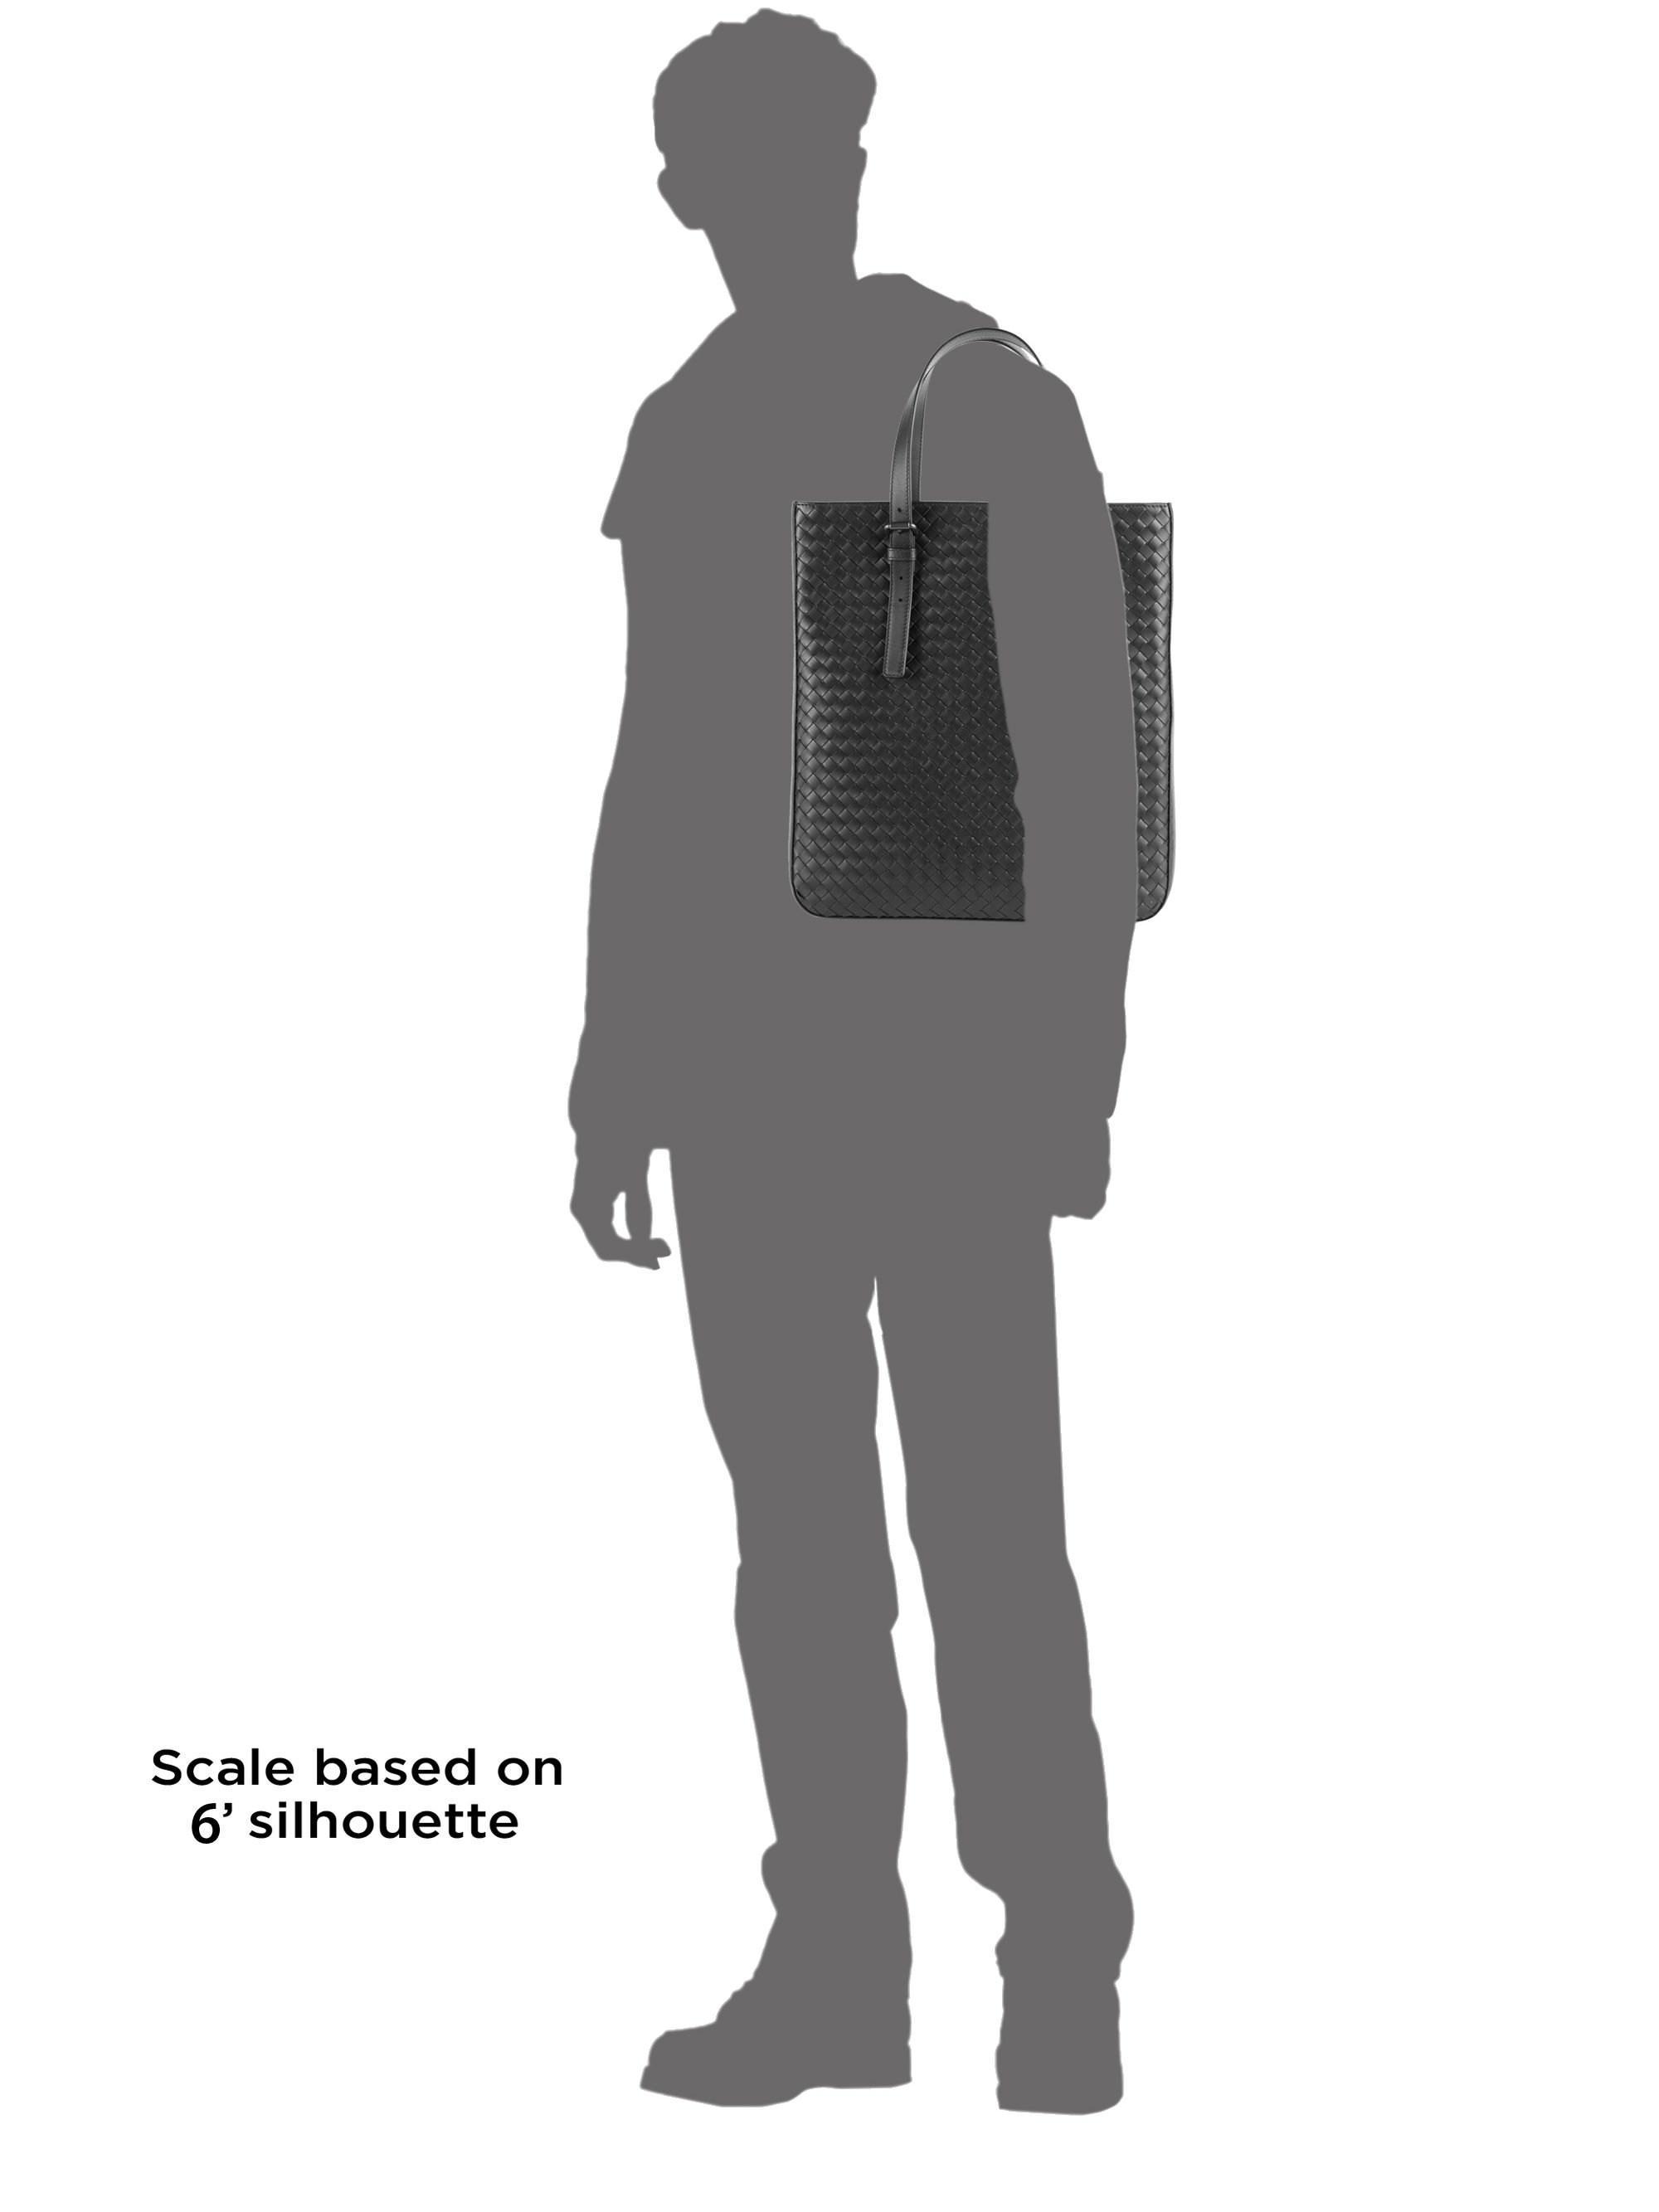 c688e30451a6 Bottega Veneta - Men s Woven Leather Slim Tote - Black for Men - Lyst. View  fullscreen